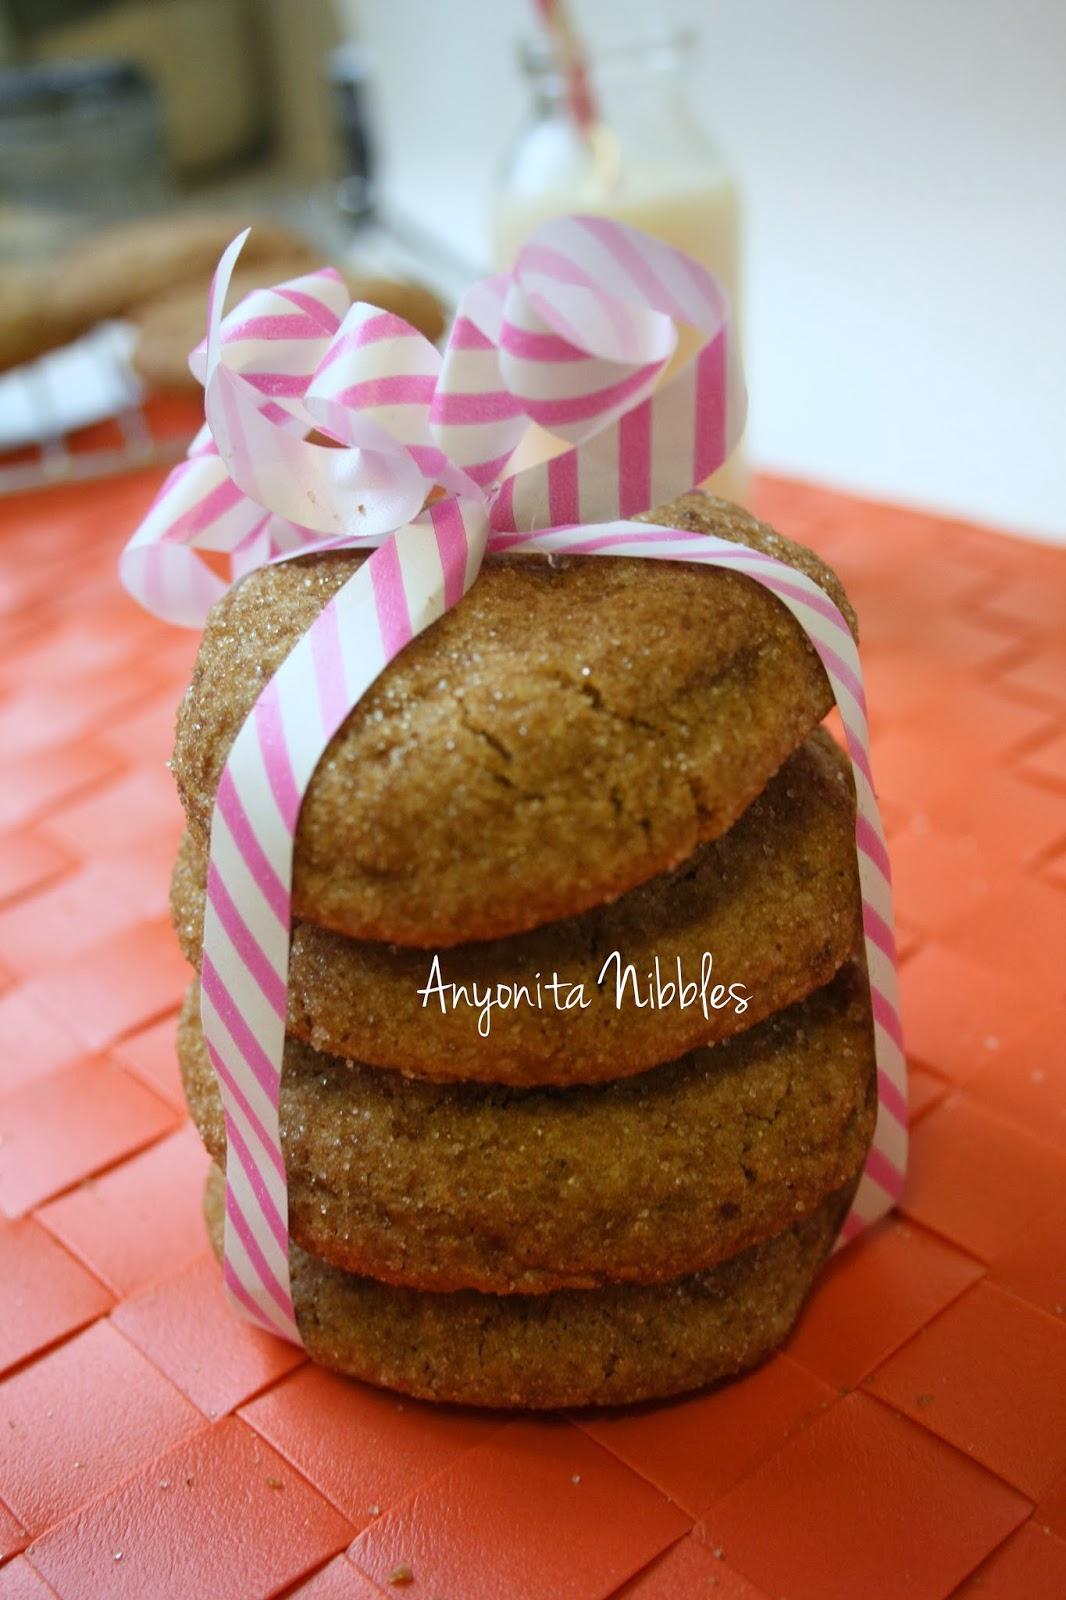 Anyonita Nibbles Gluten Free Recipes Gluten Free Soft